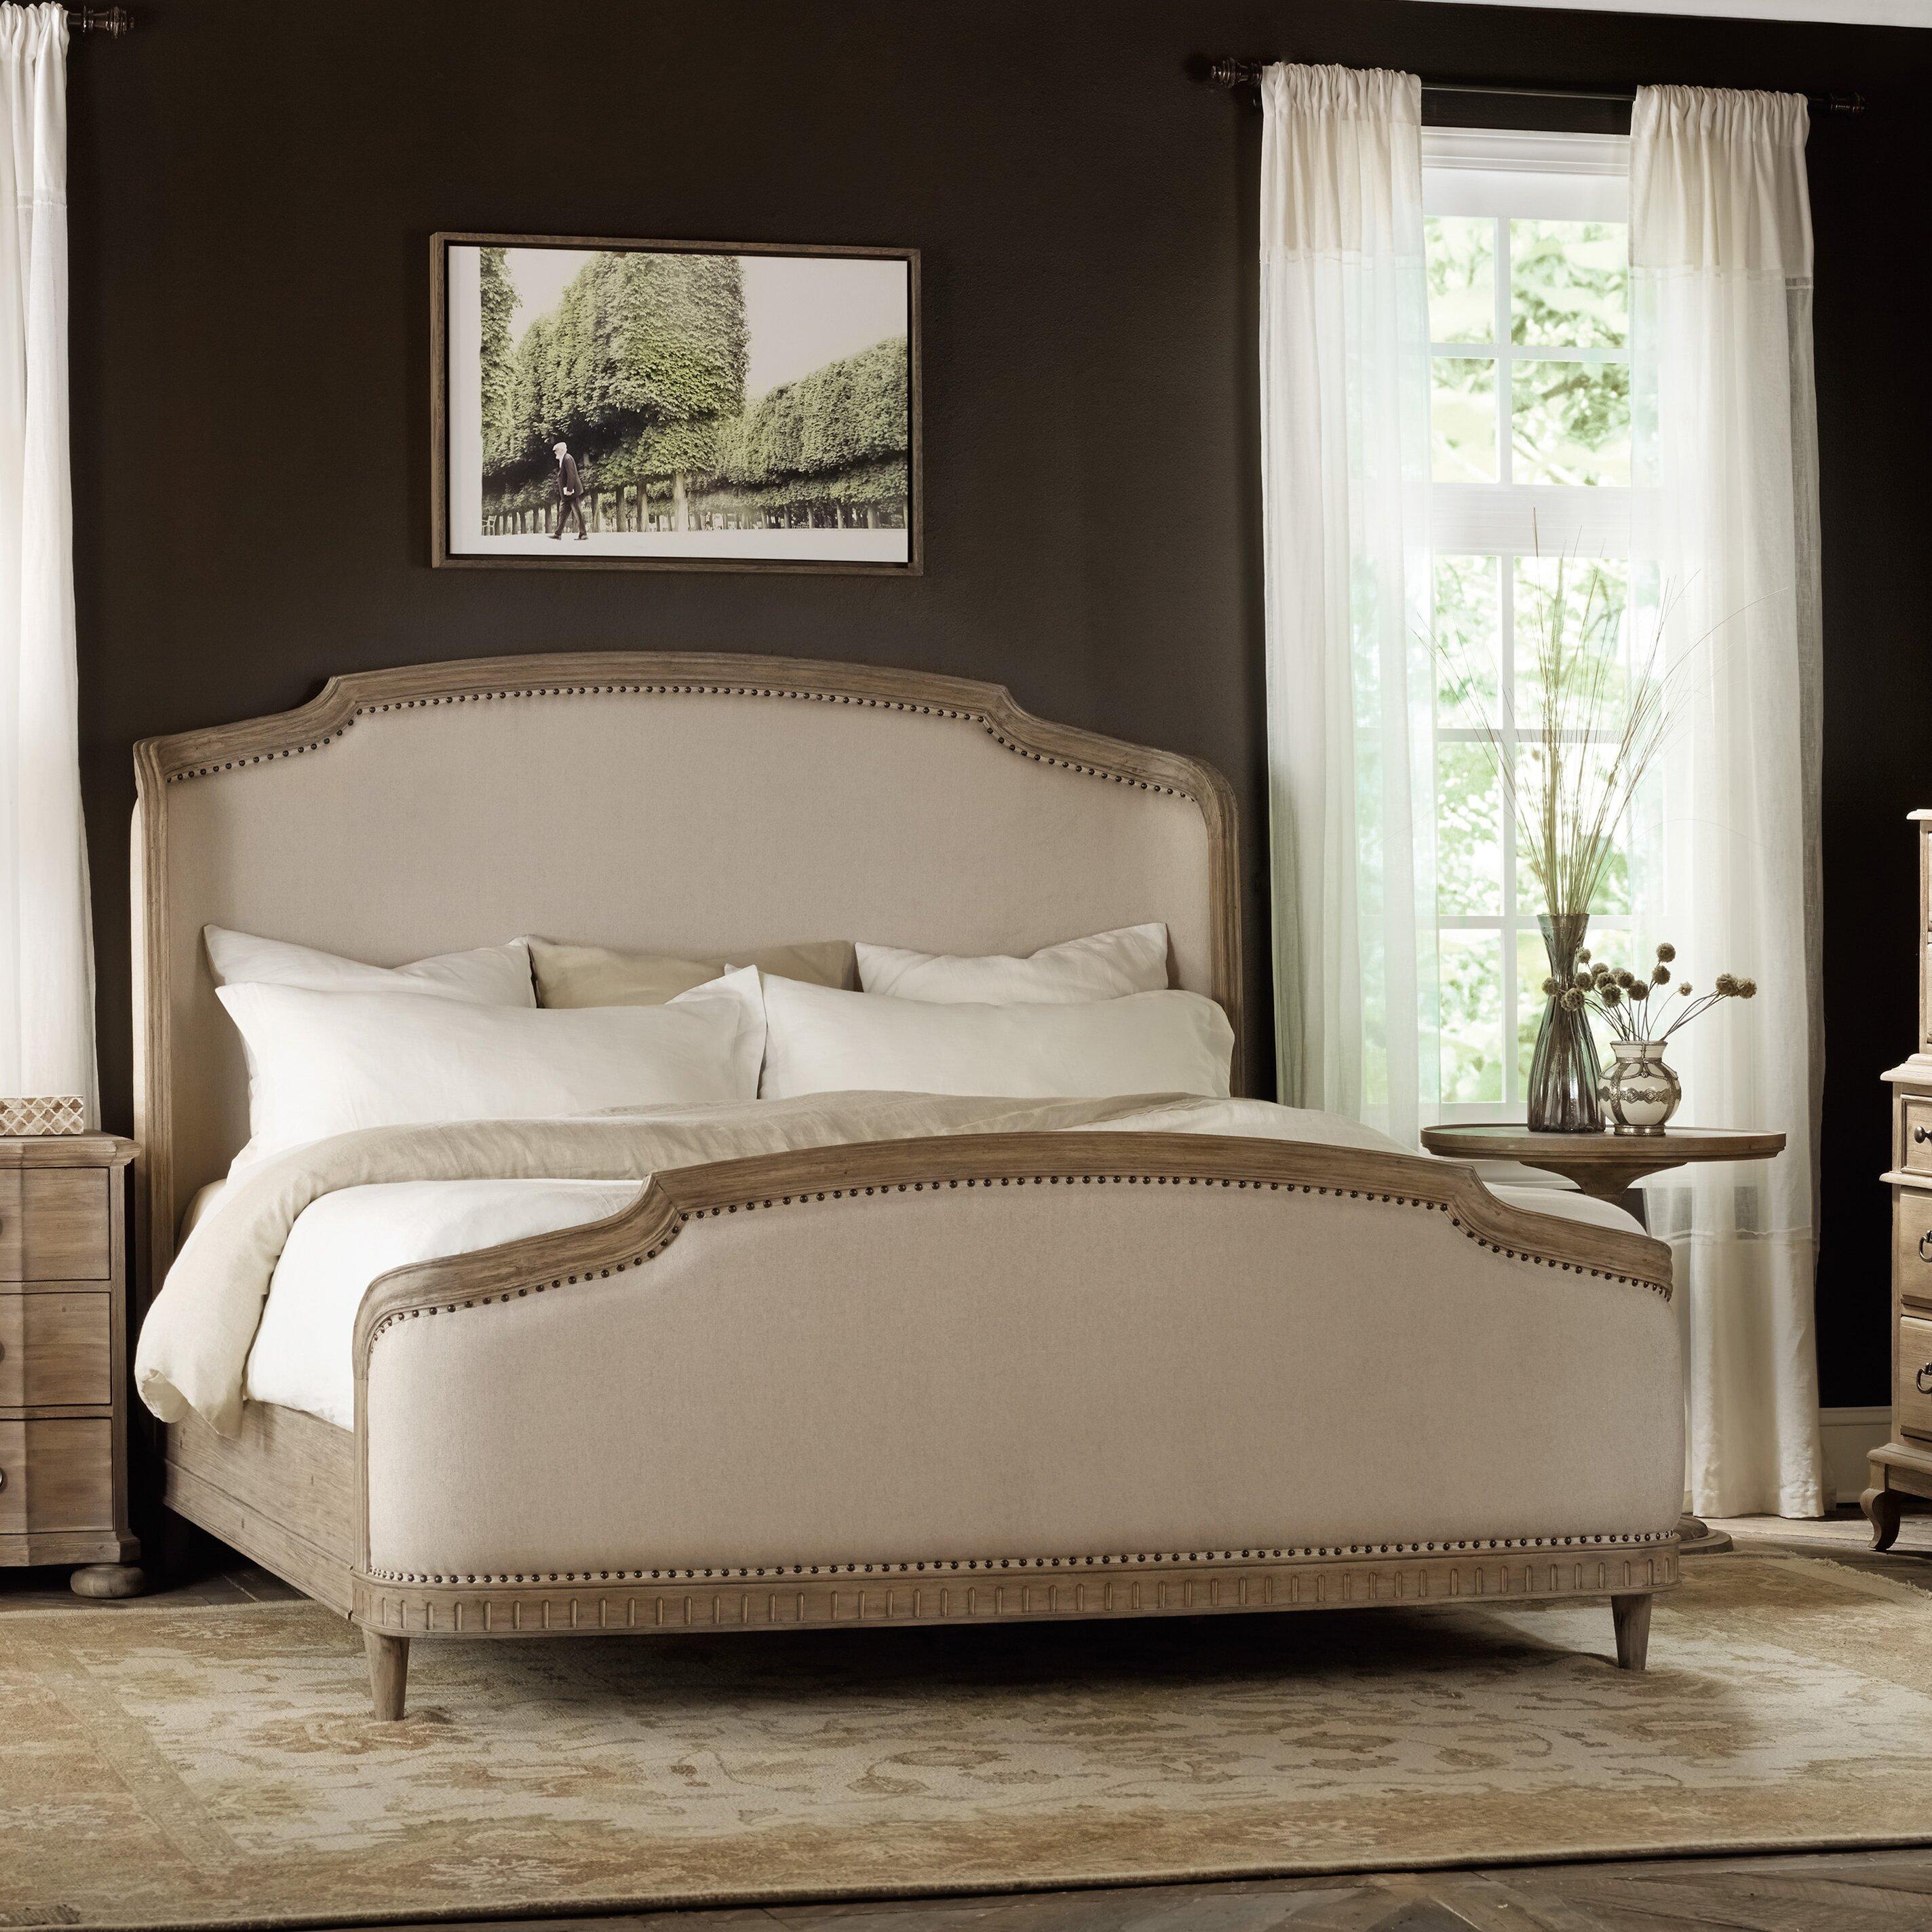 Hooker furniture corsica upholstered panel bed reviews for Panel beds for sale